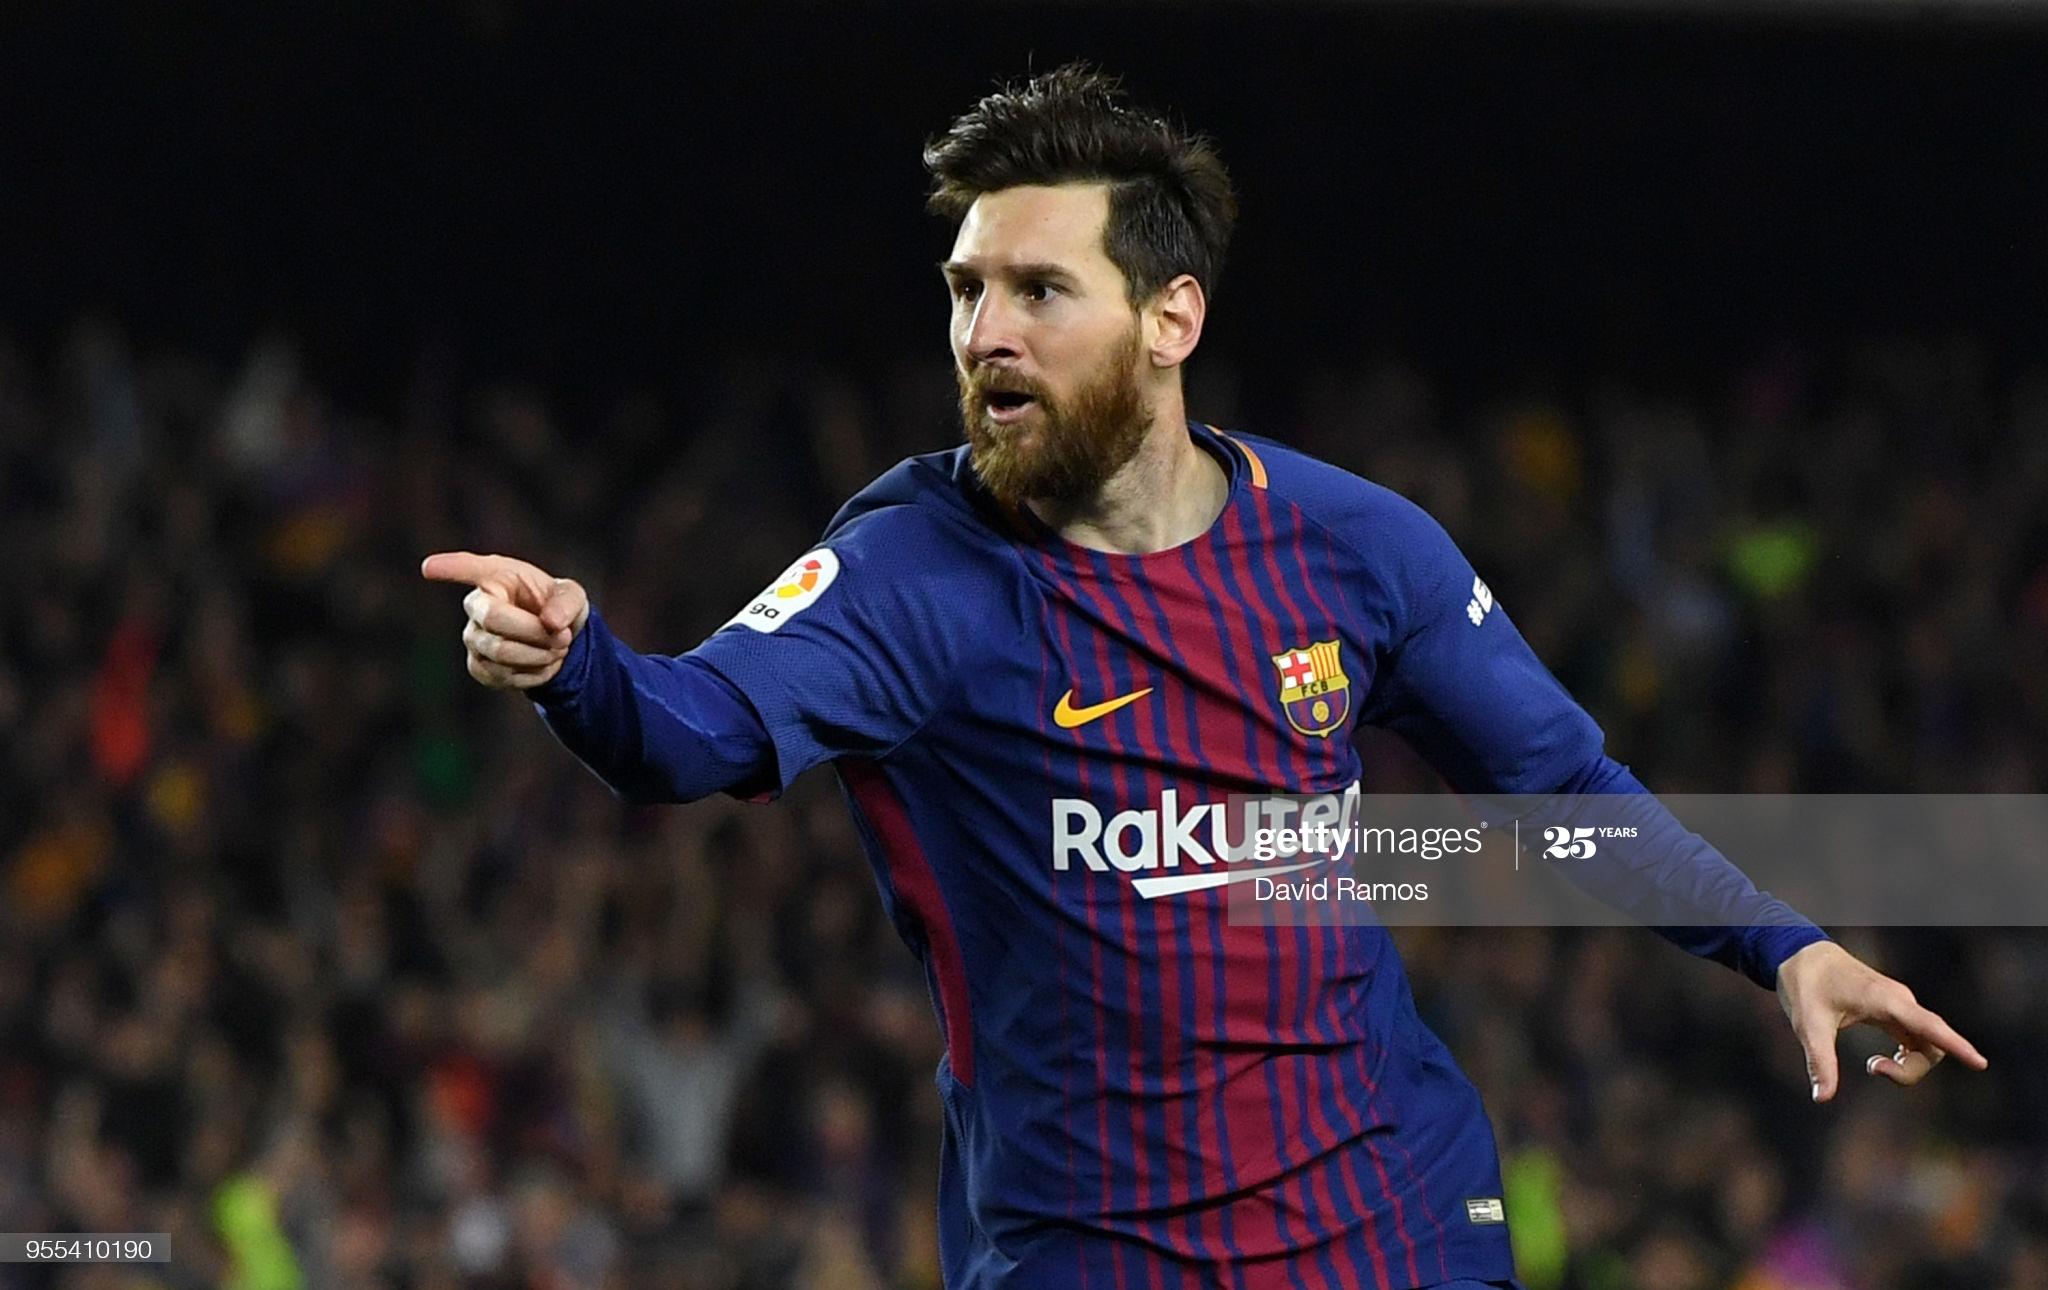 Barcelona: Leo Messi